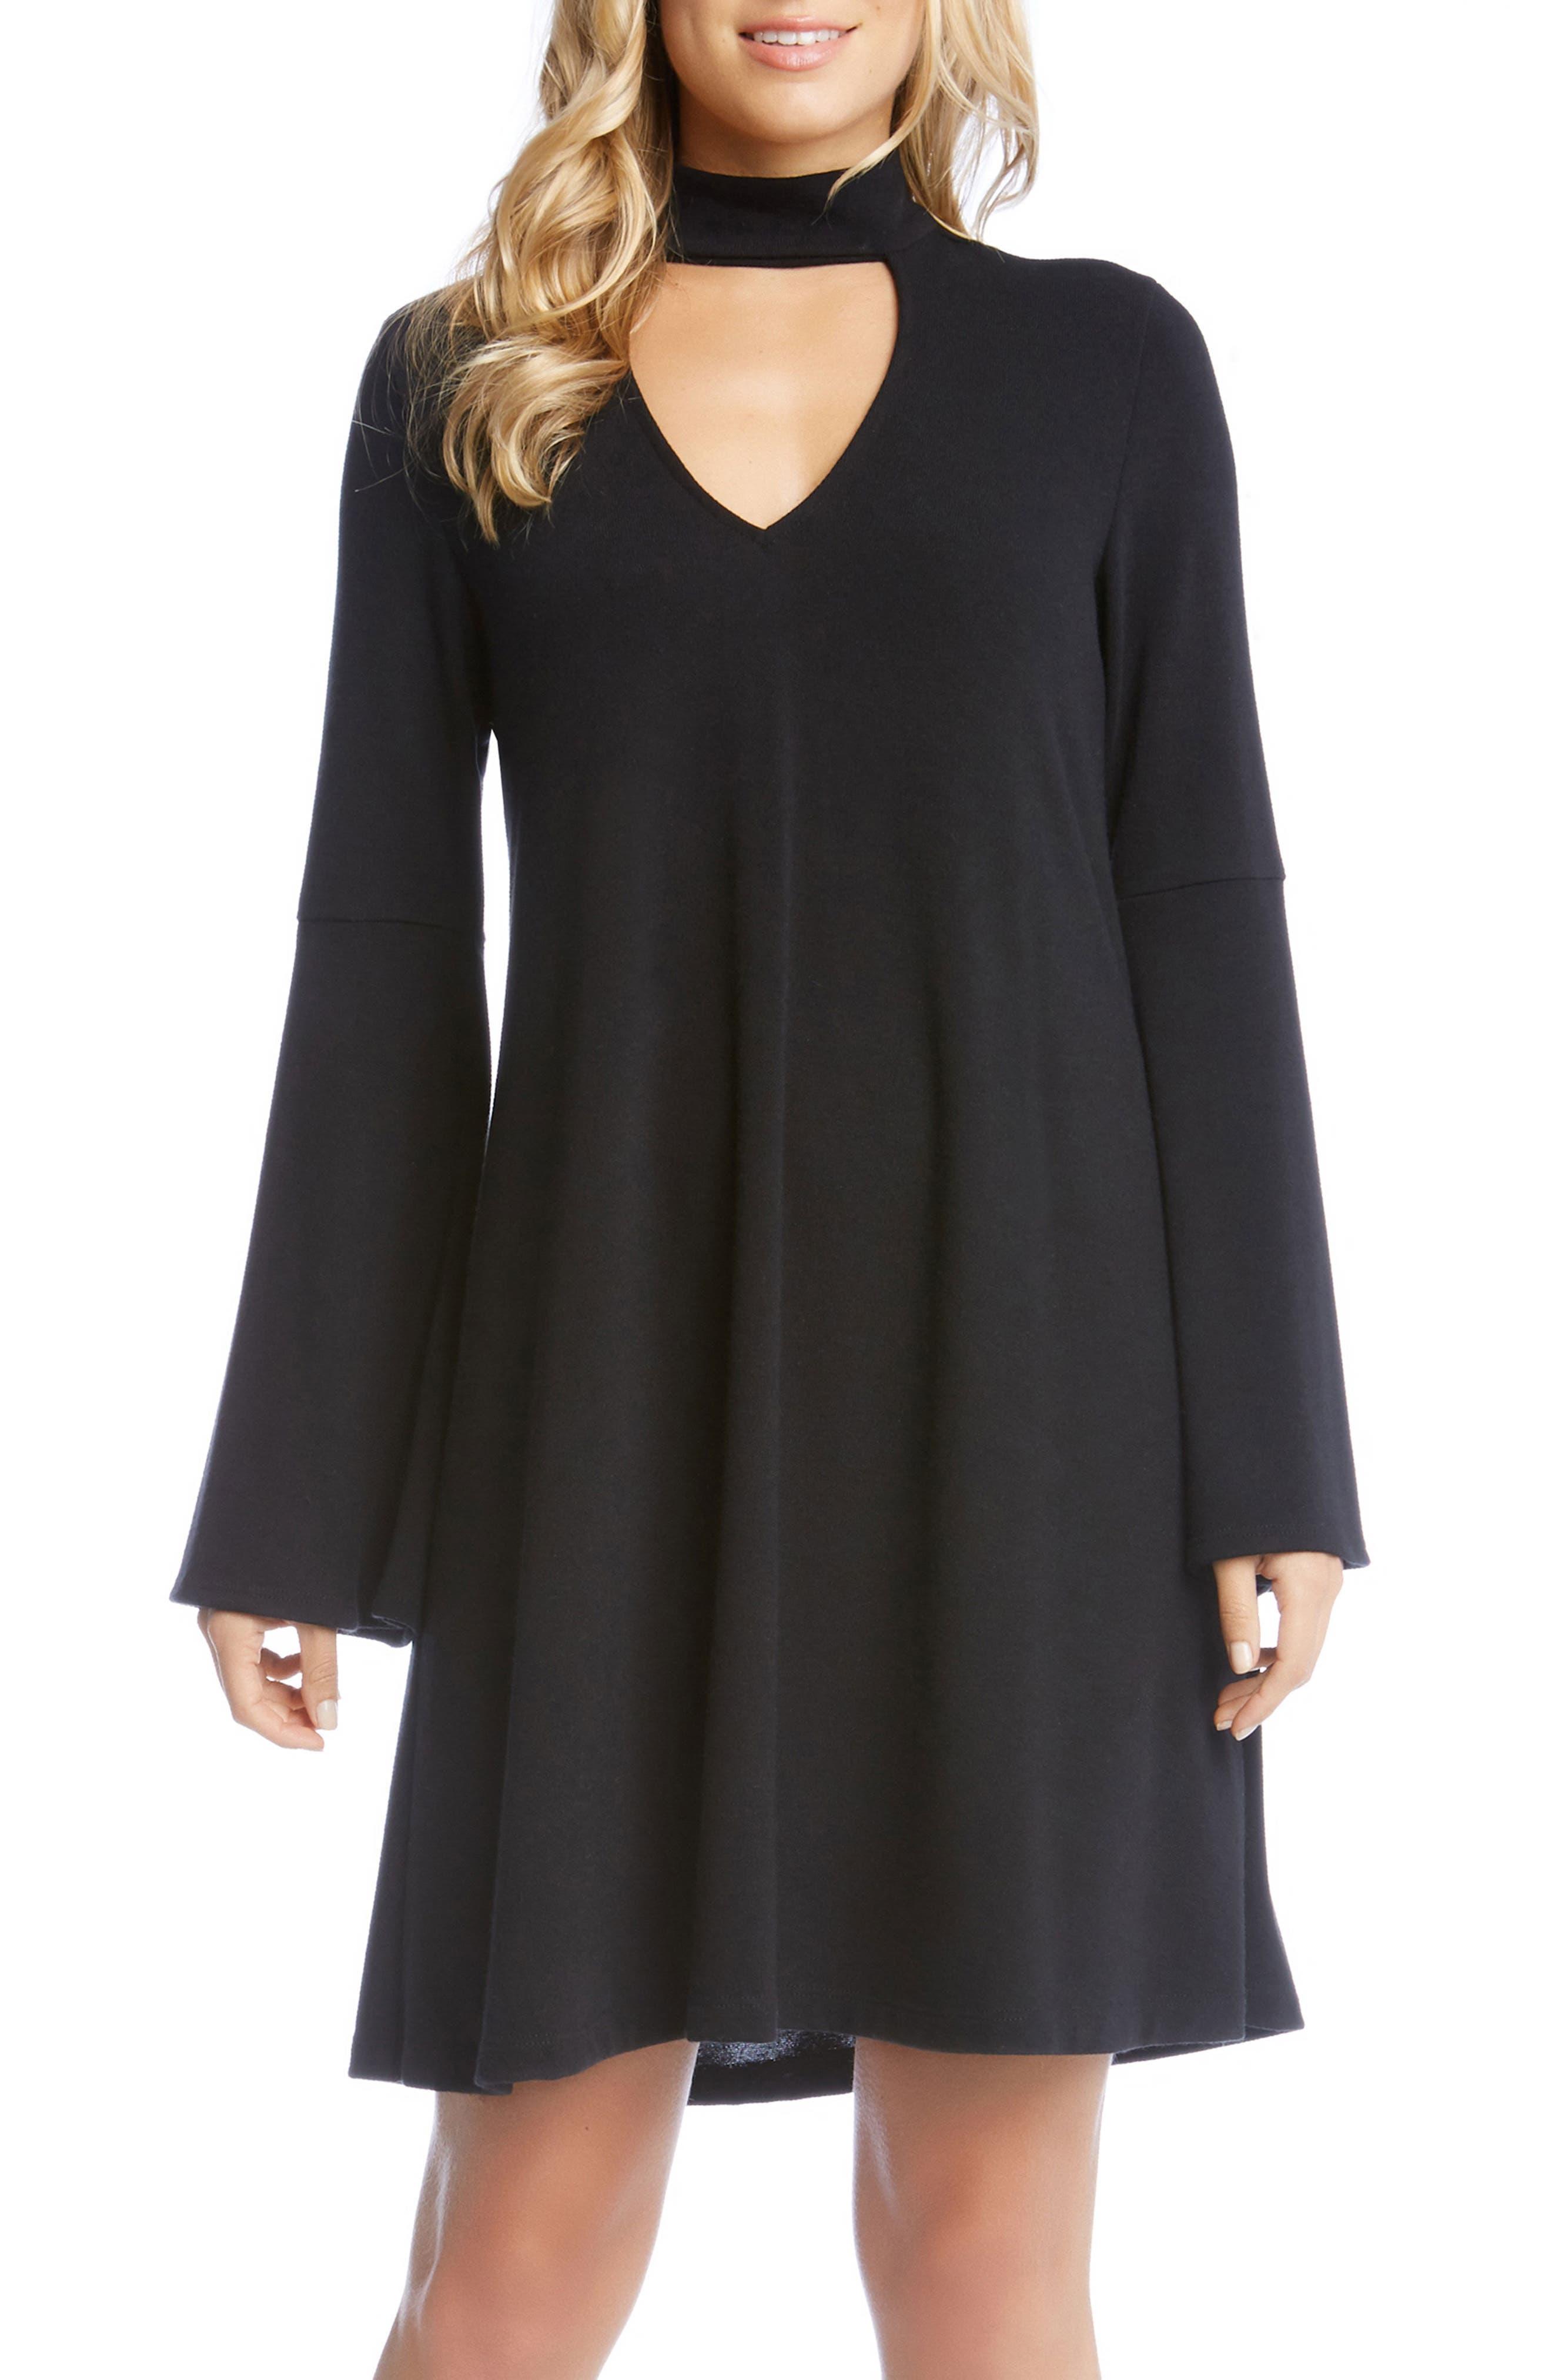 Alternate Image 1 Selected - Karen Kane Taylor Choker Neck Dress